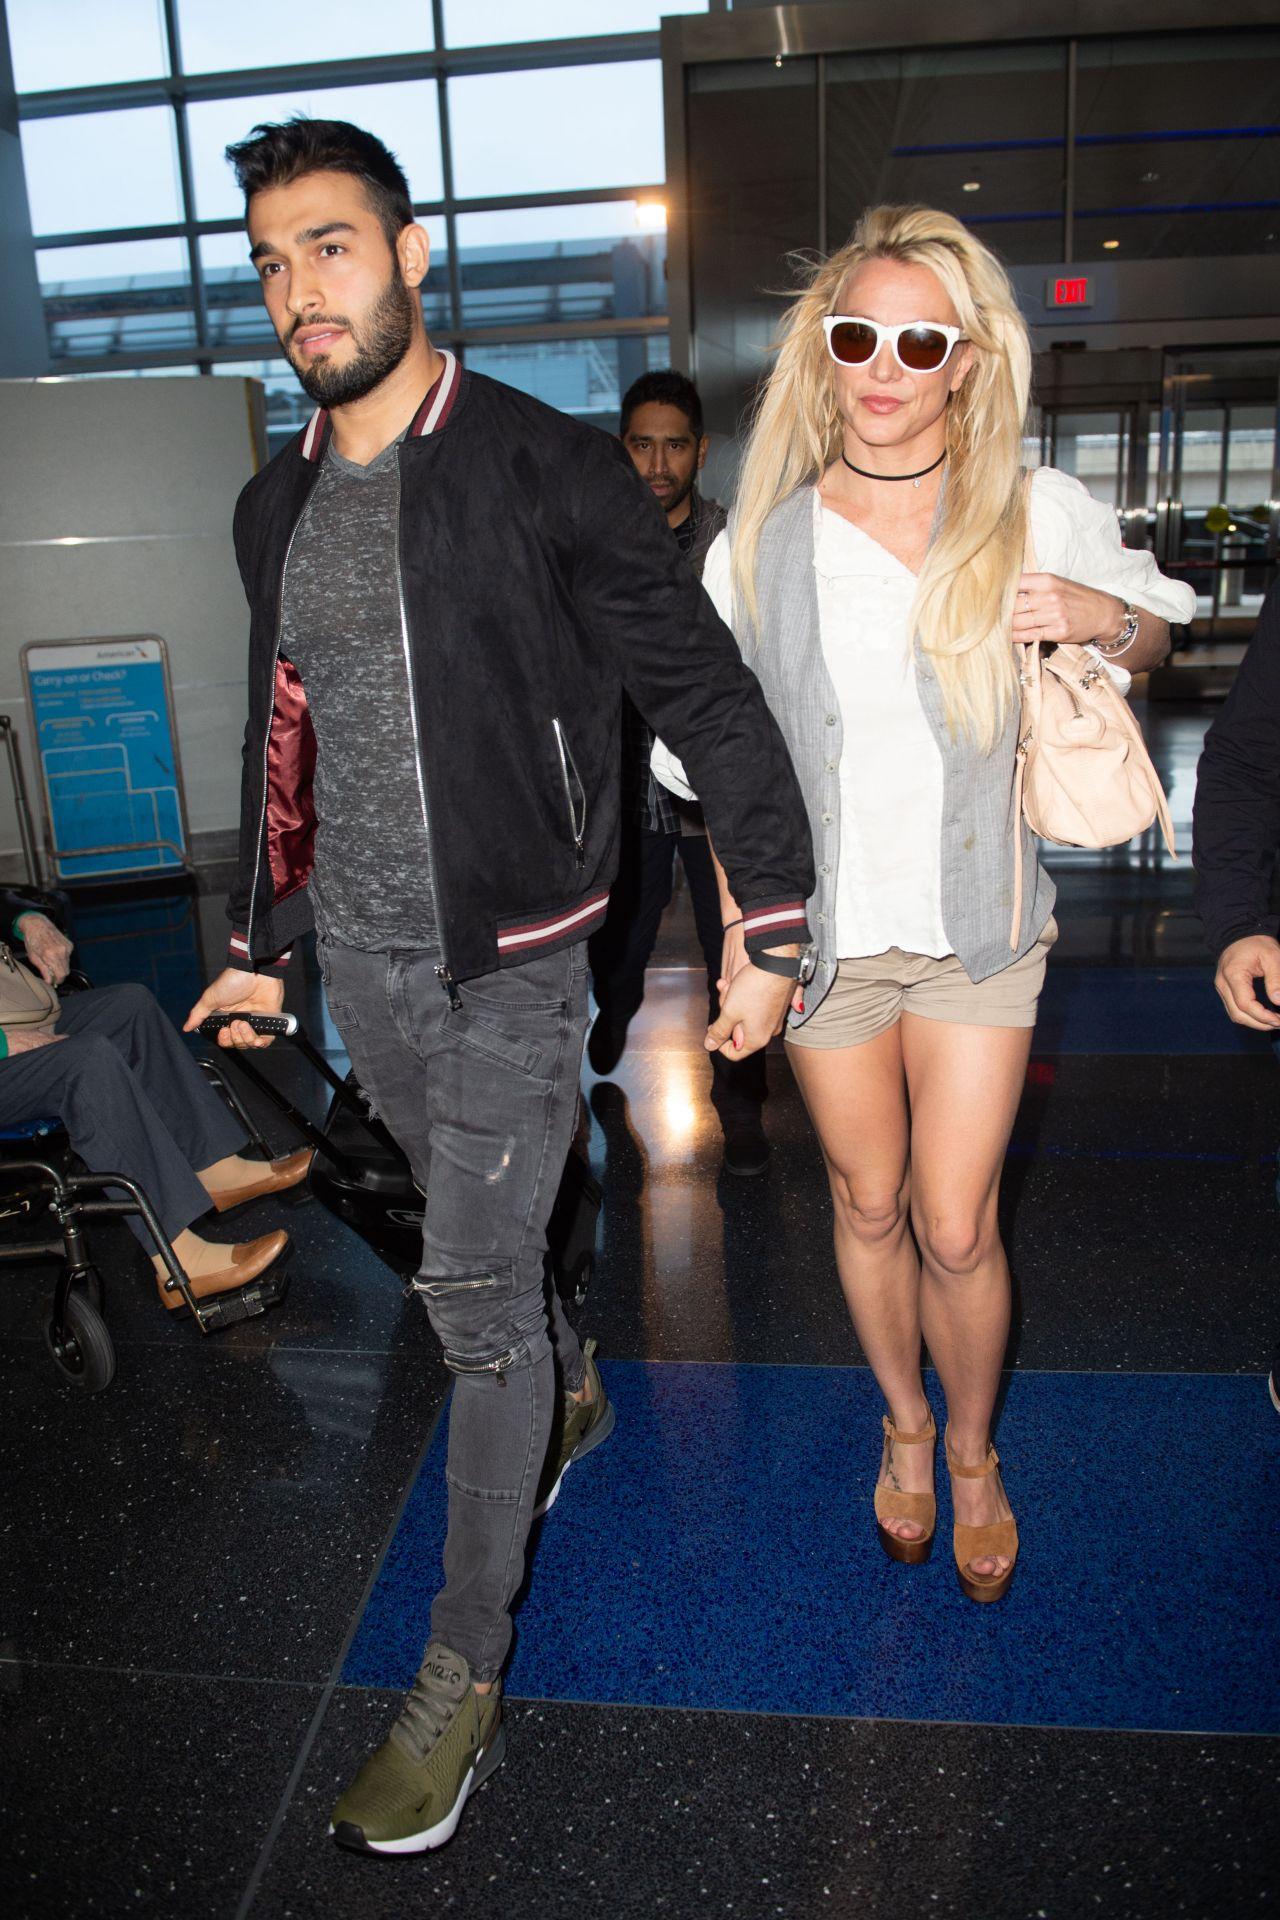 Britney Spears boyfriend Sam Asgahri calls her father